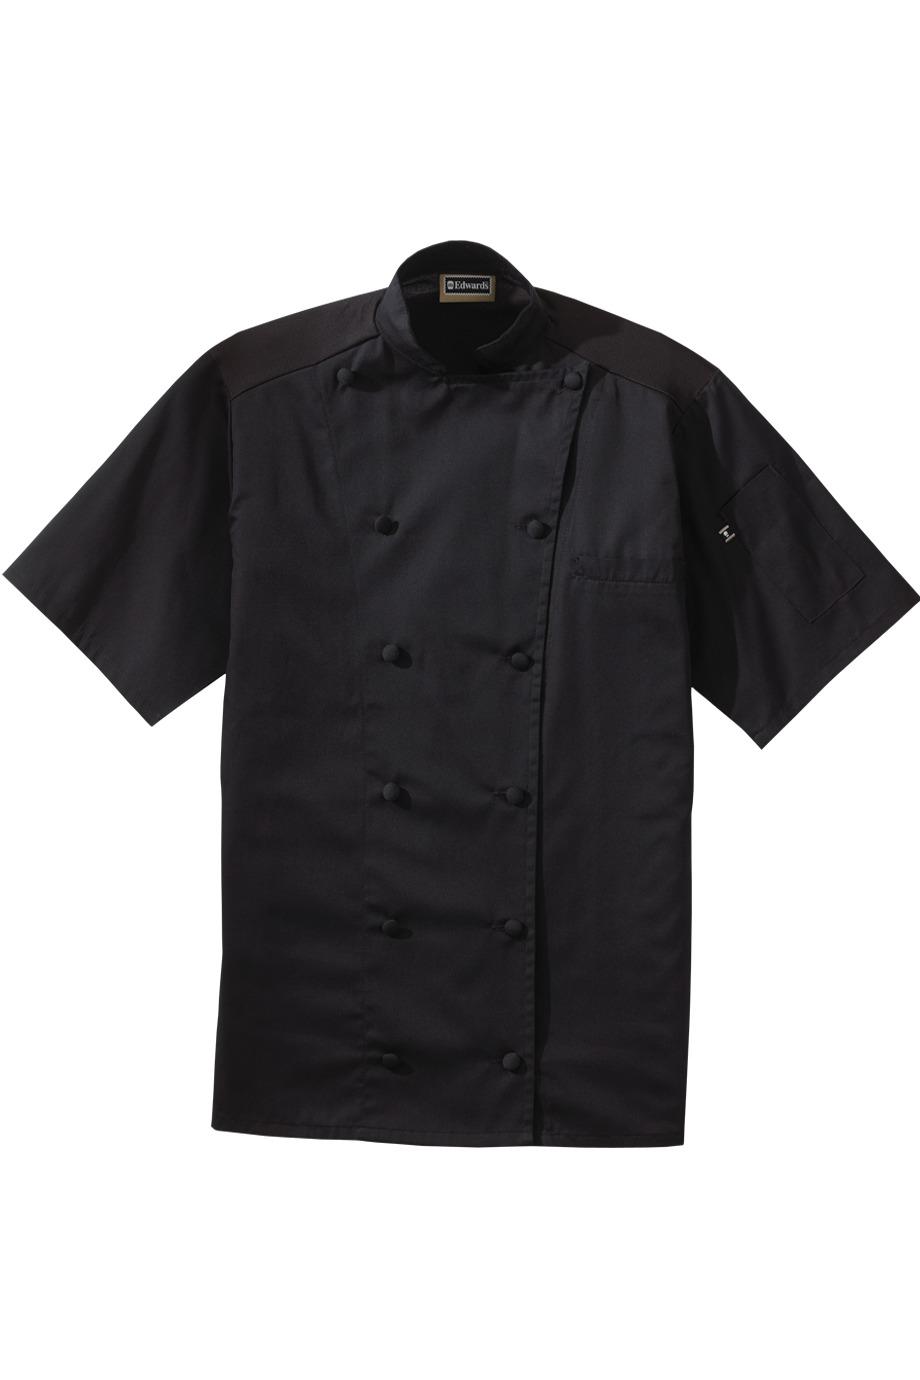 Edwards Garment 3331 - Leightweight Coat